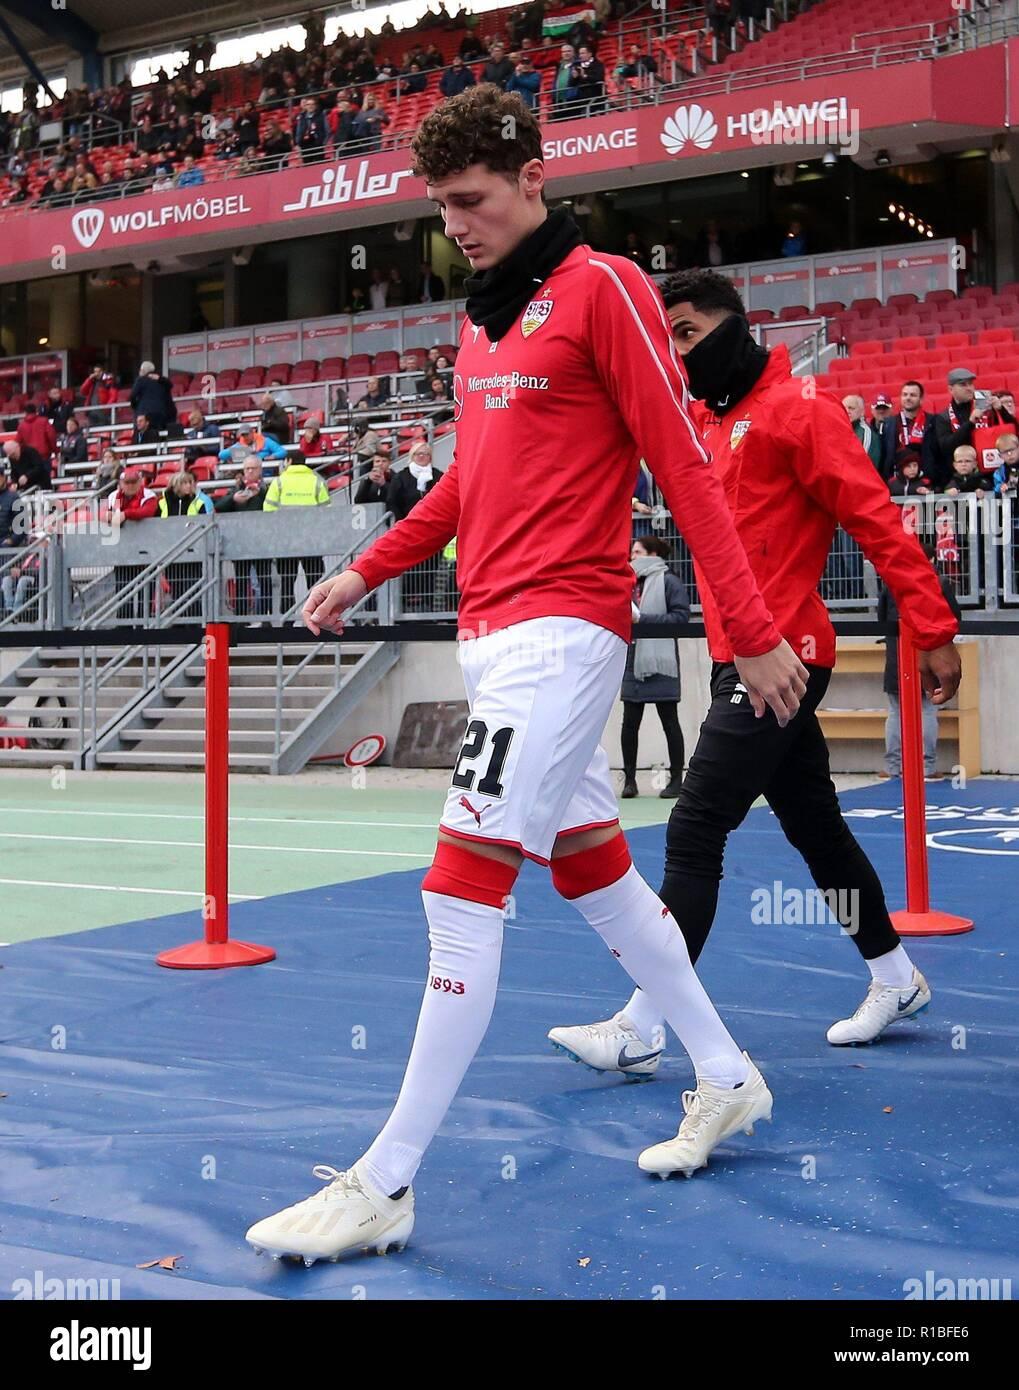 firo: 10.11.2018, Fuvuball, 1.Bundesliga, season 2018/2019, 1.FC Nvºrnberg - VFB Stuttgart 0: 2, Benjamin Pavard, VFB, Stuttgart, VFB Stuttgart, whole figure | usage worldwide - Stock Image